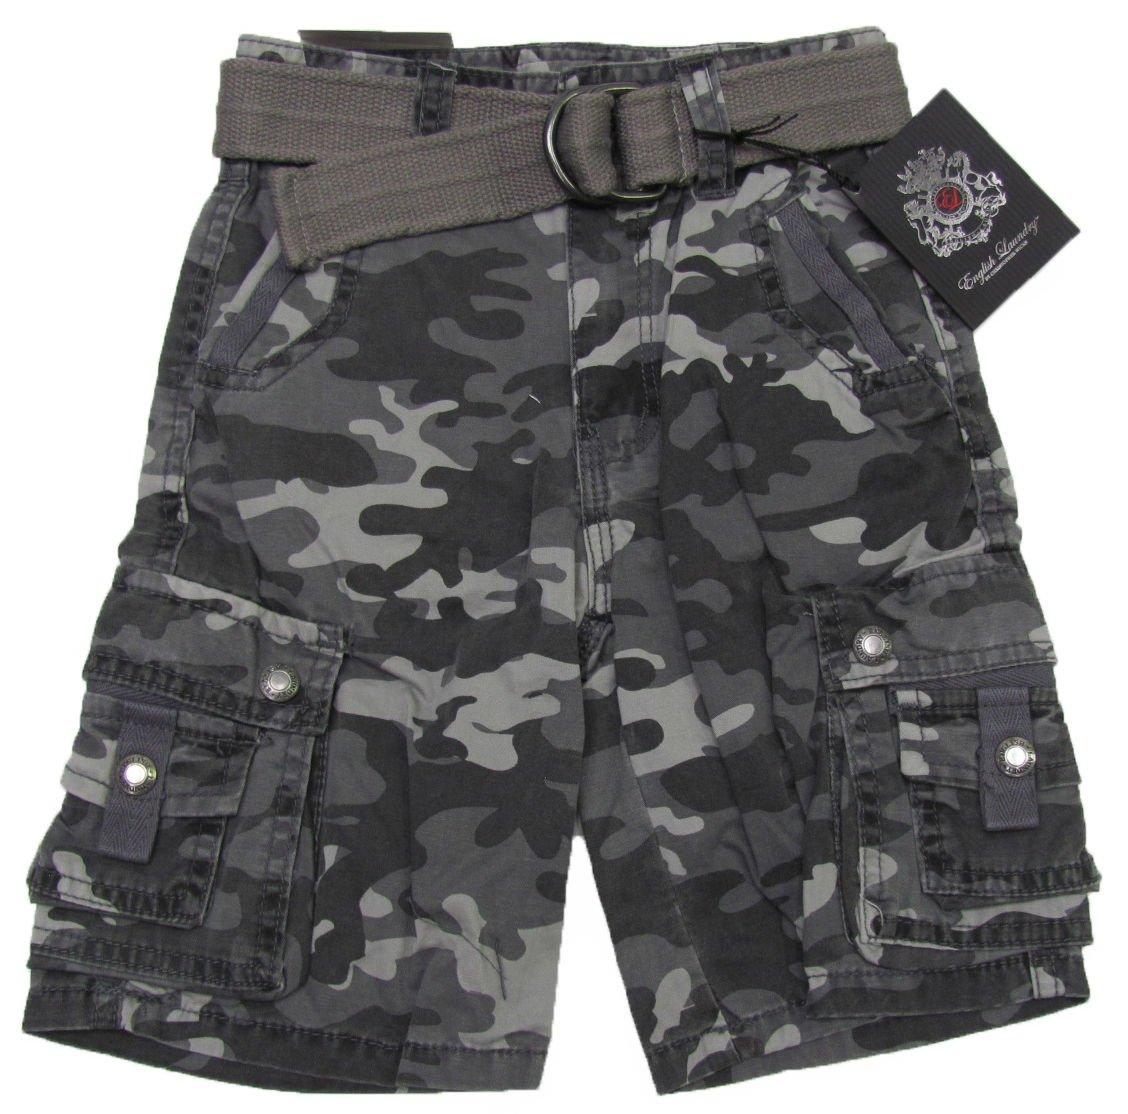 English Laundry Boys size 5 Gray Camo Cargo Shorts with Belt New